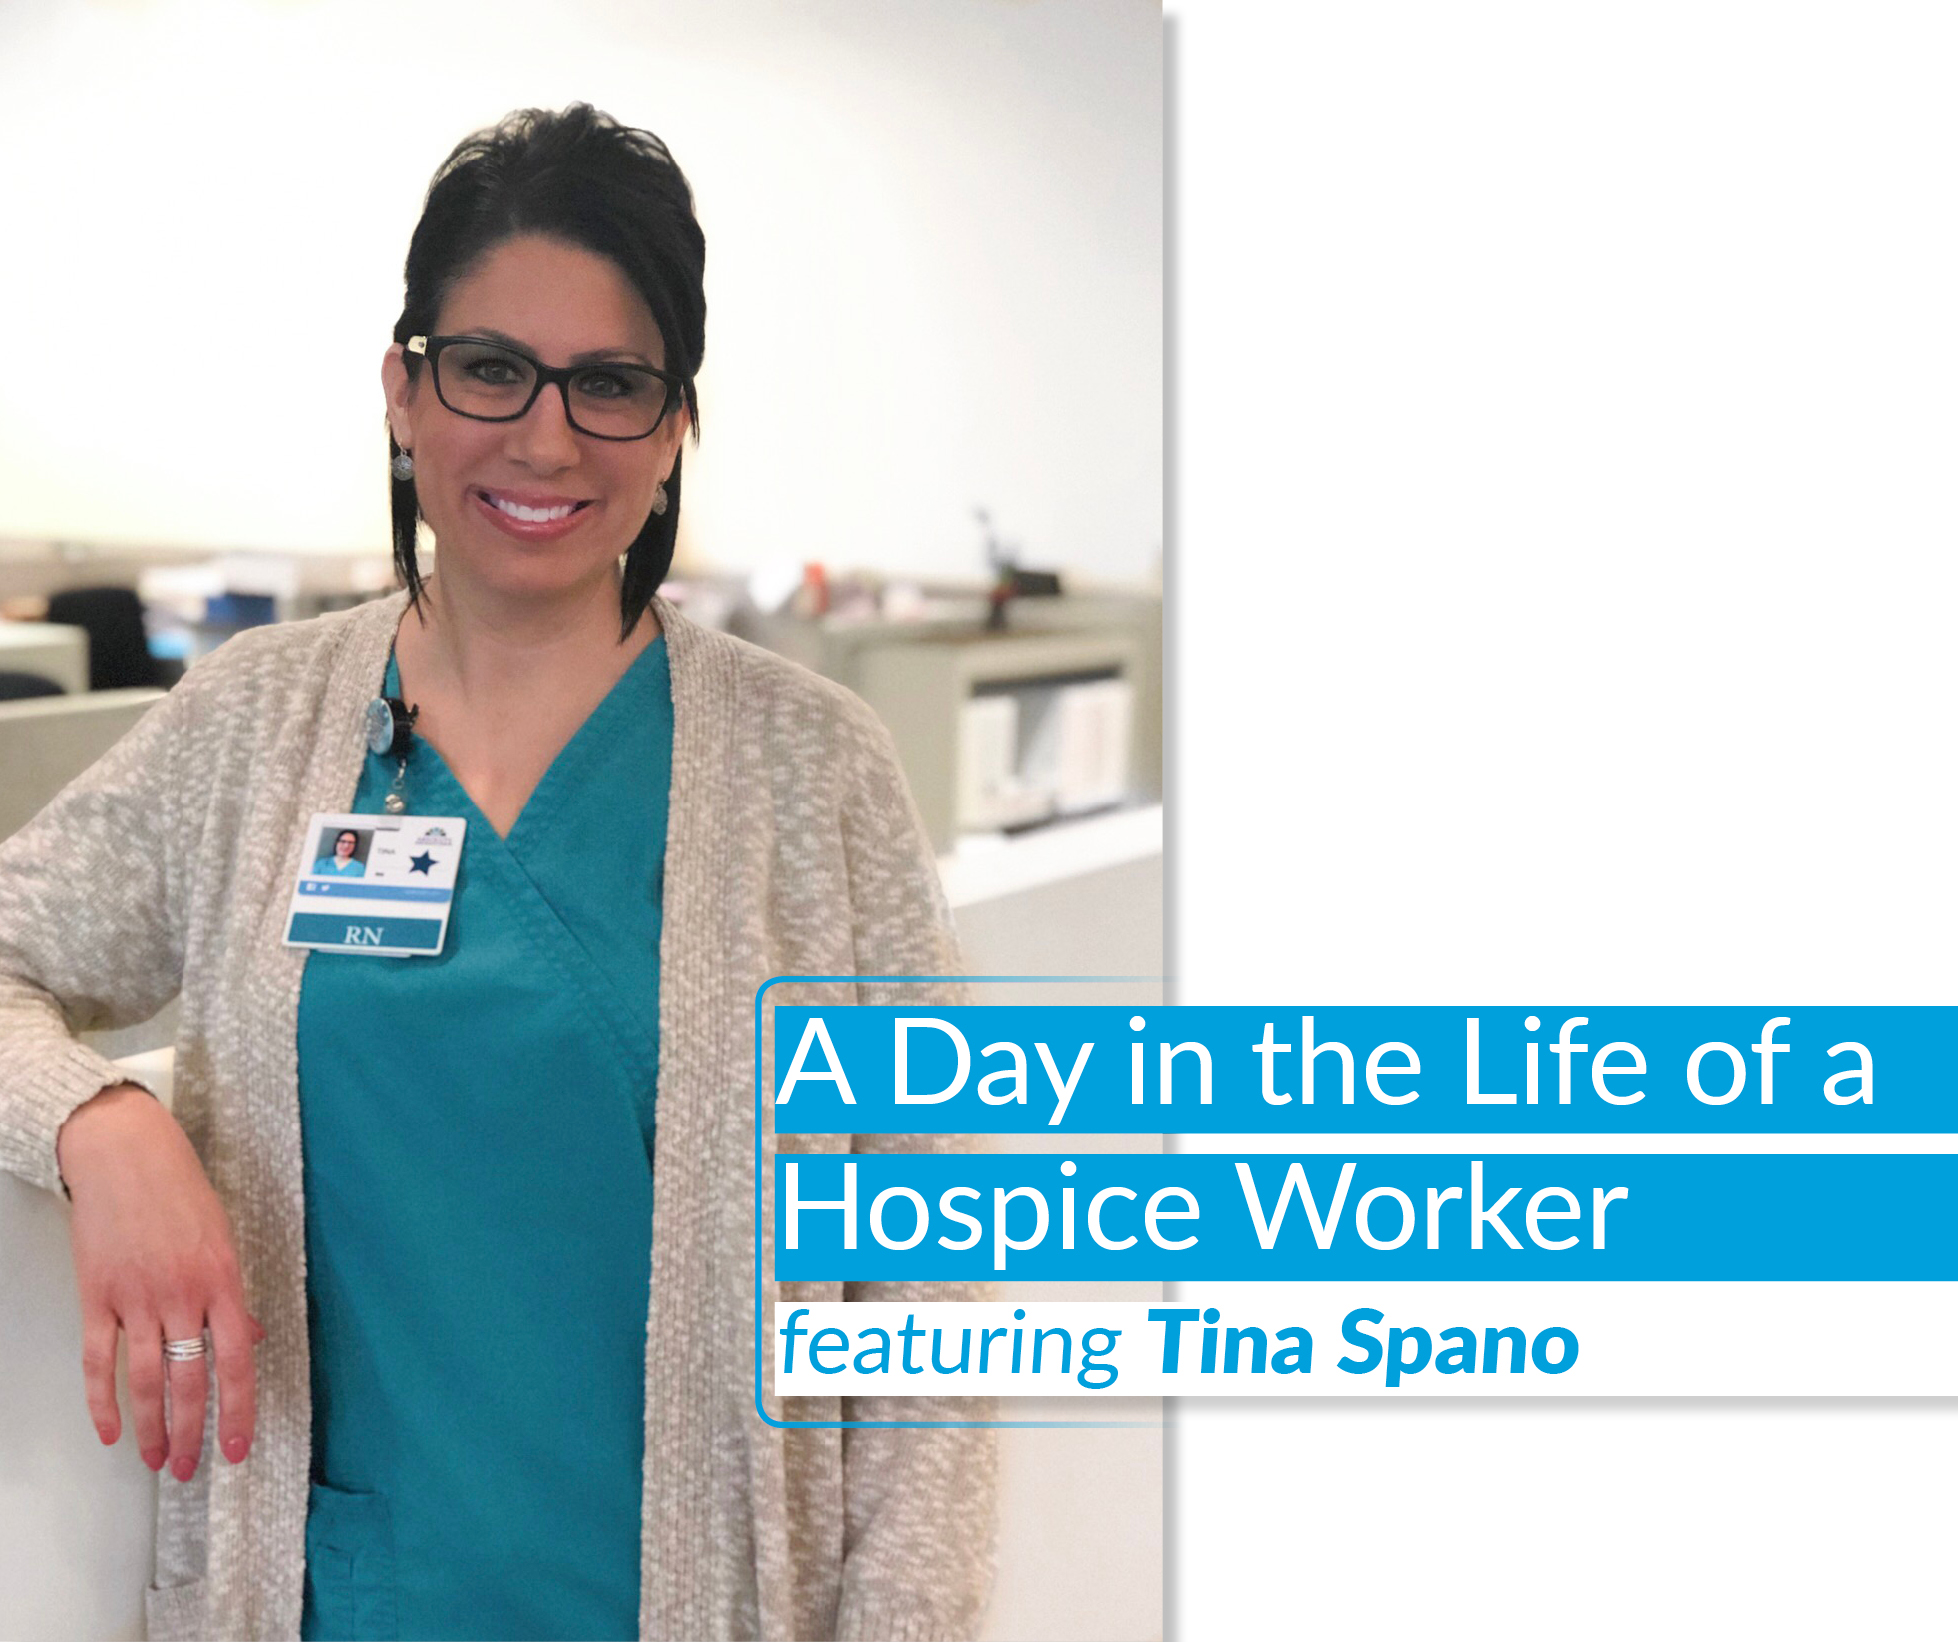 TinaSpano_HospiceWorker.jpg